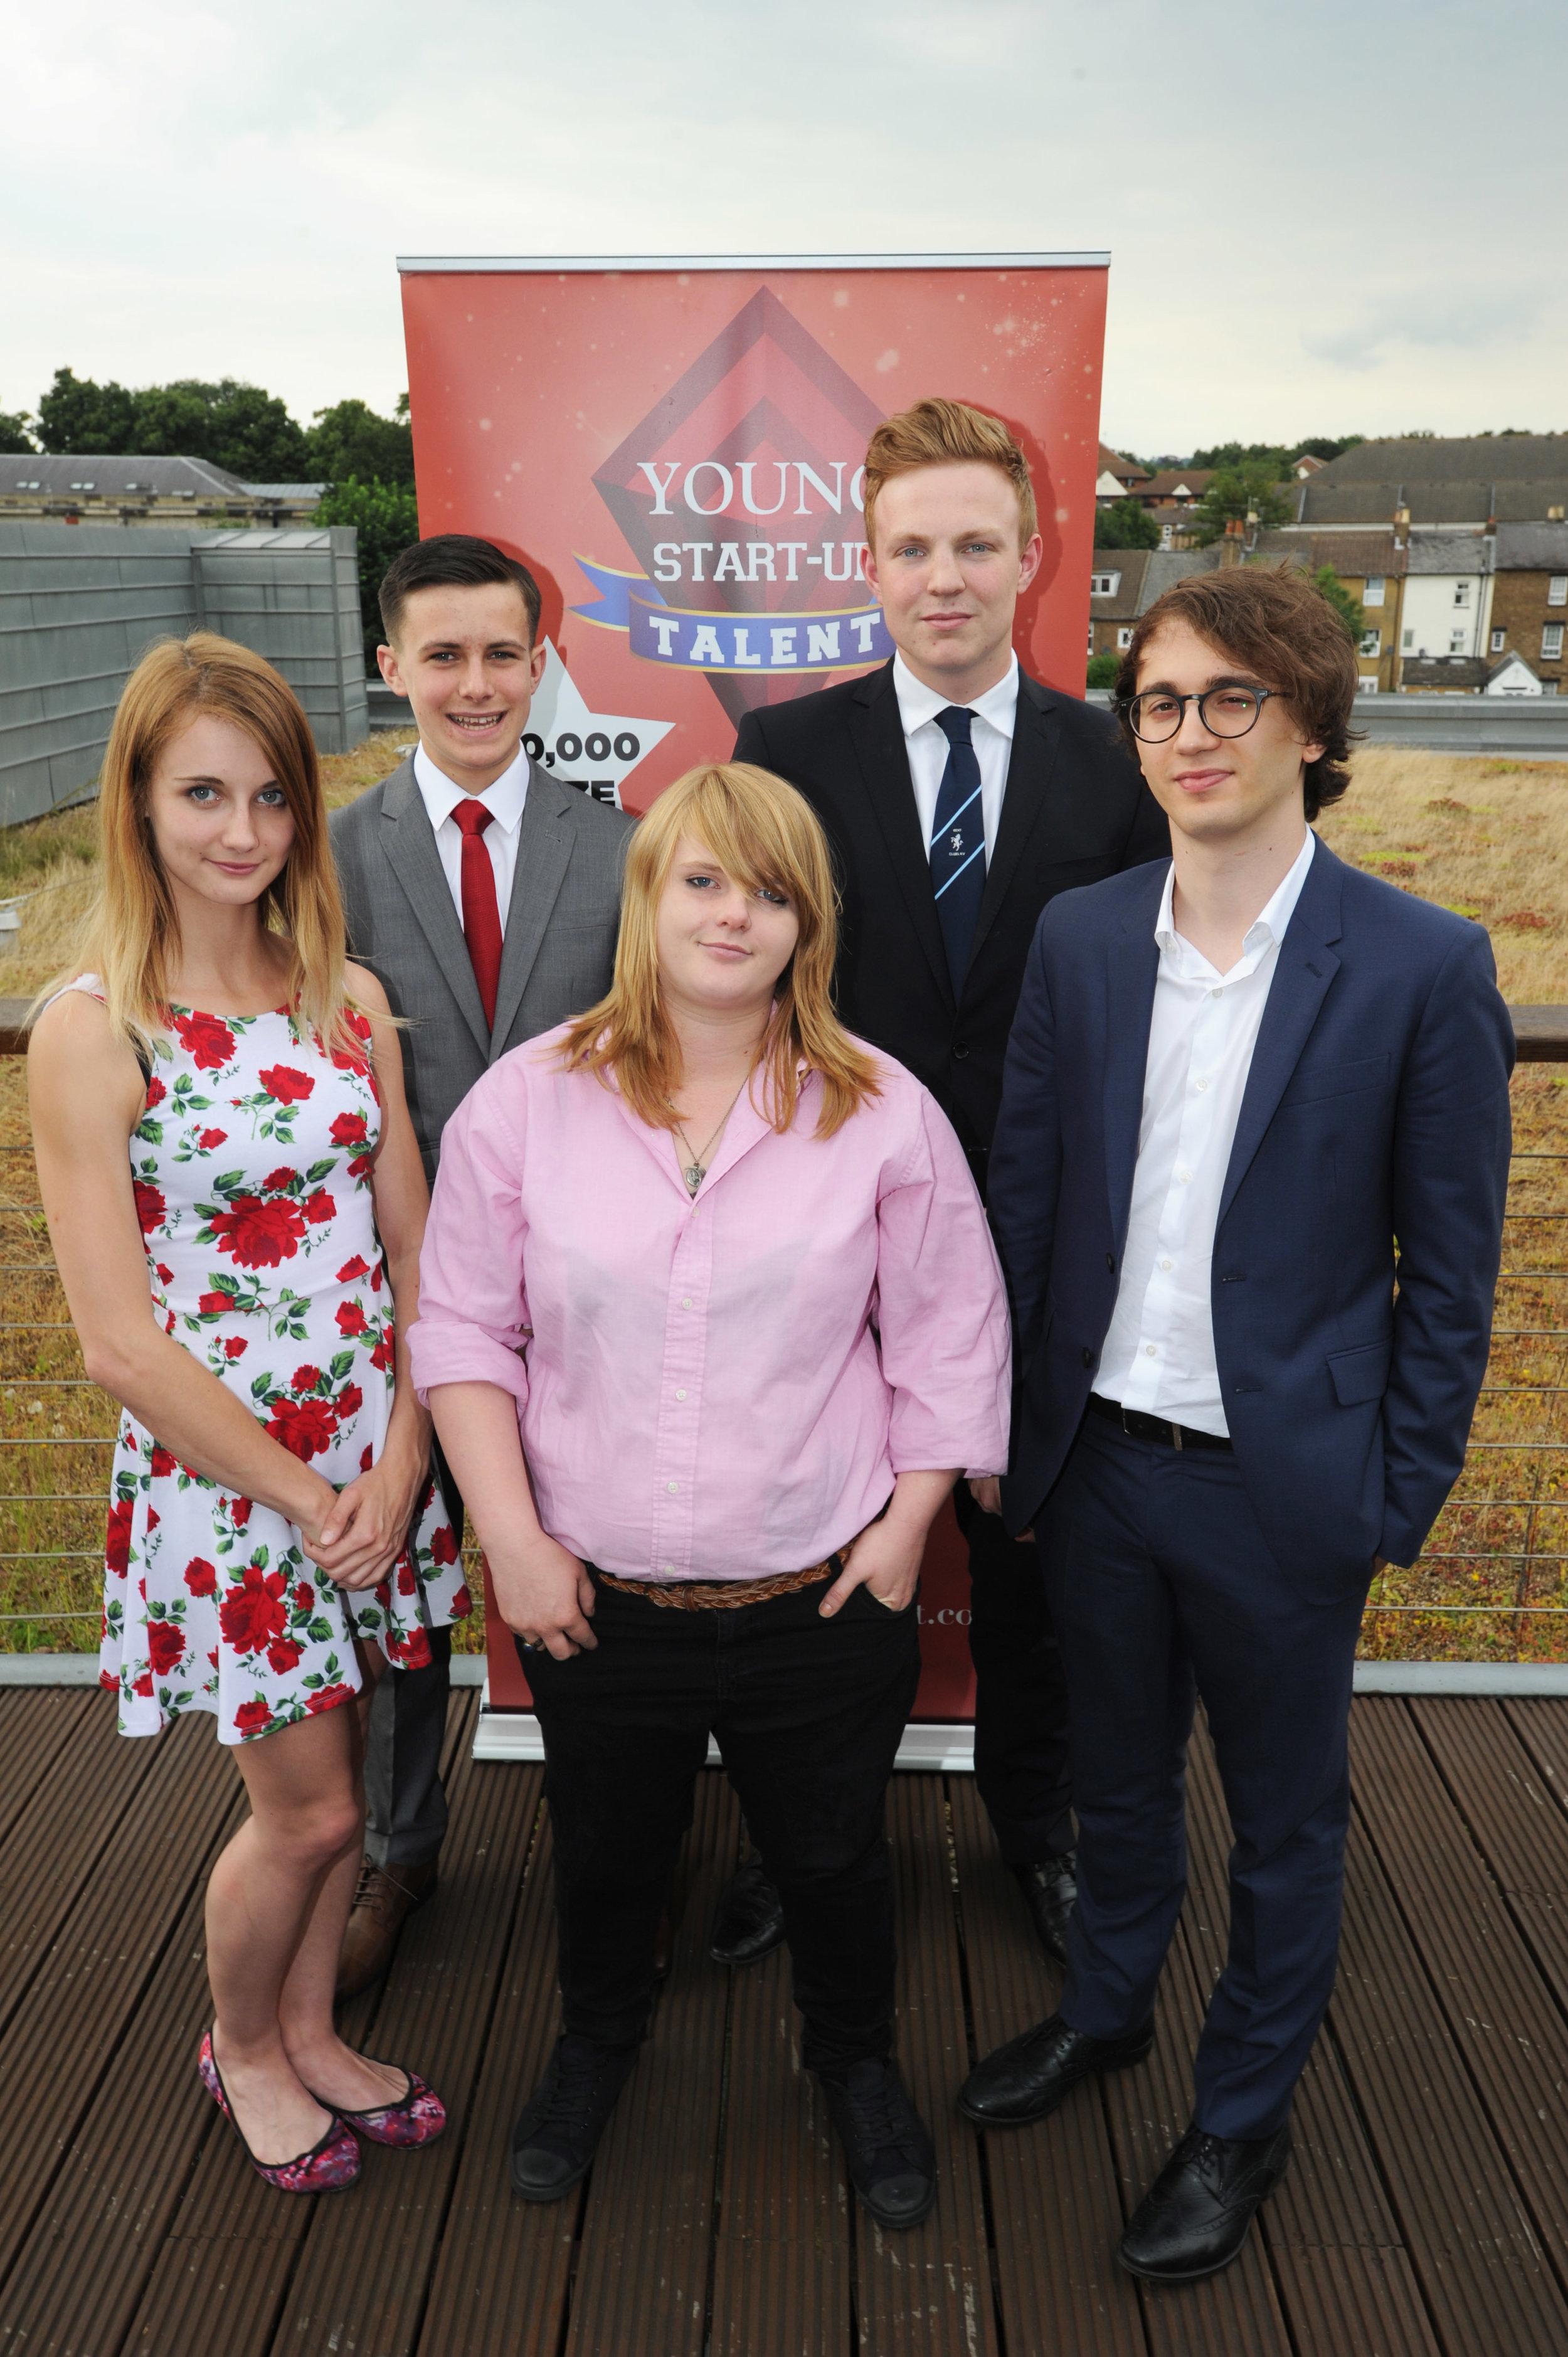 YST Kent finalists 2016 – Left to Right Kelly Culver, Jonathan Wood, Serena Christie, Ben Jeffries, Edoardo Abati